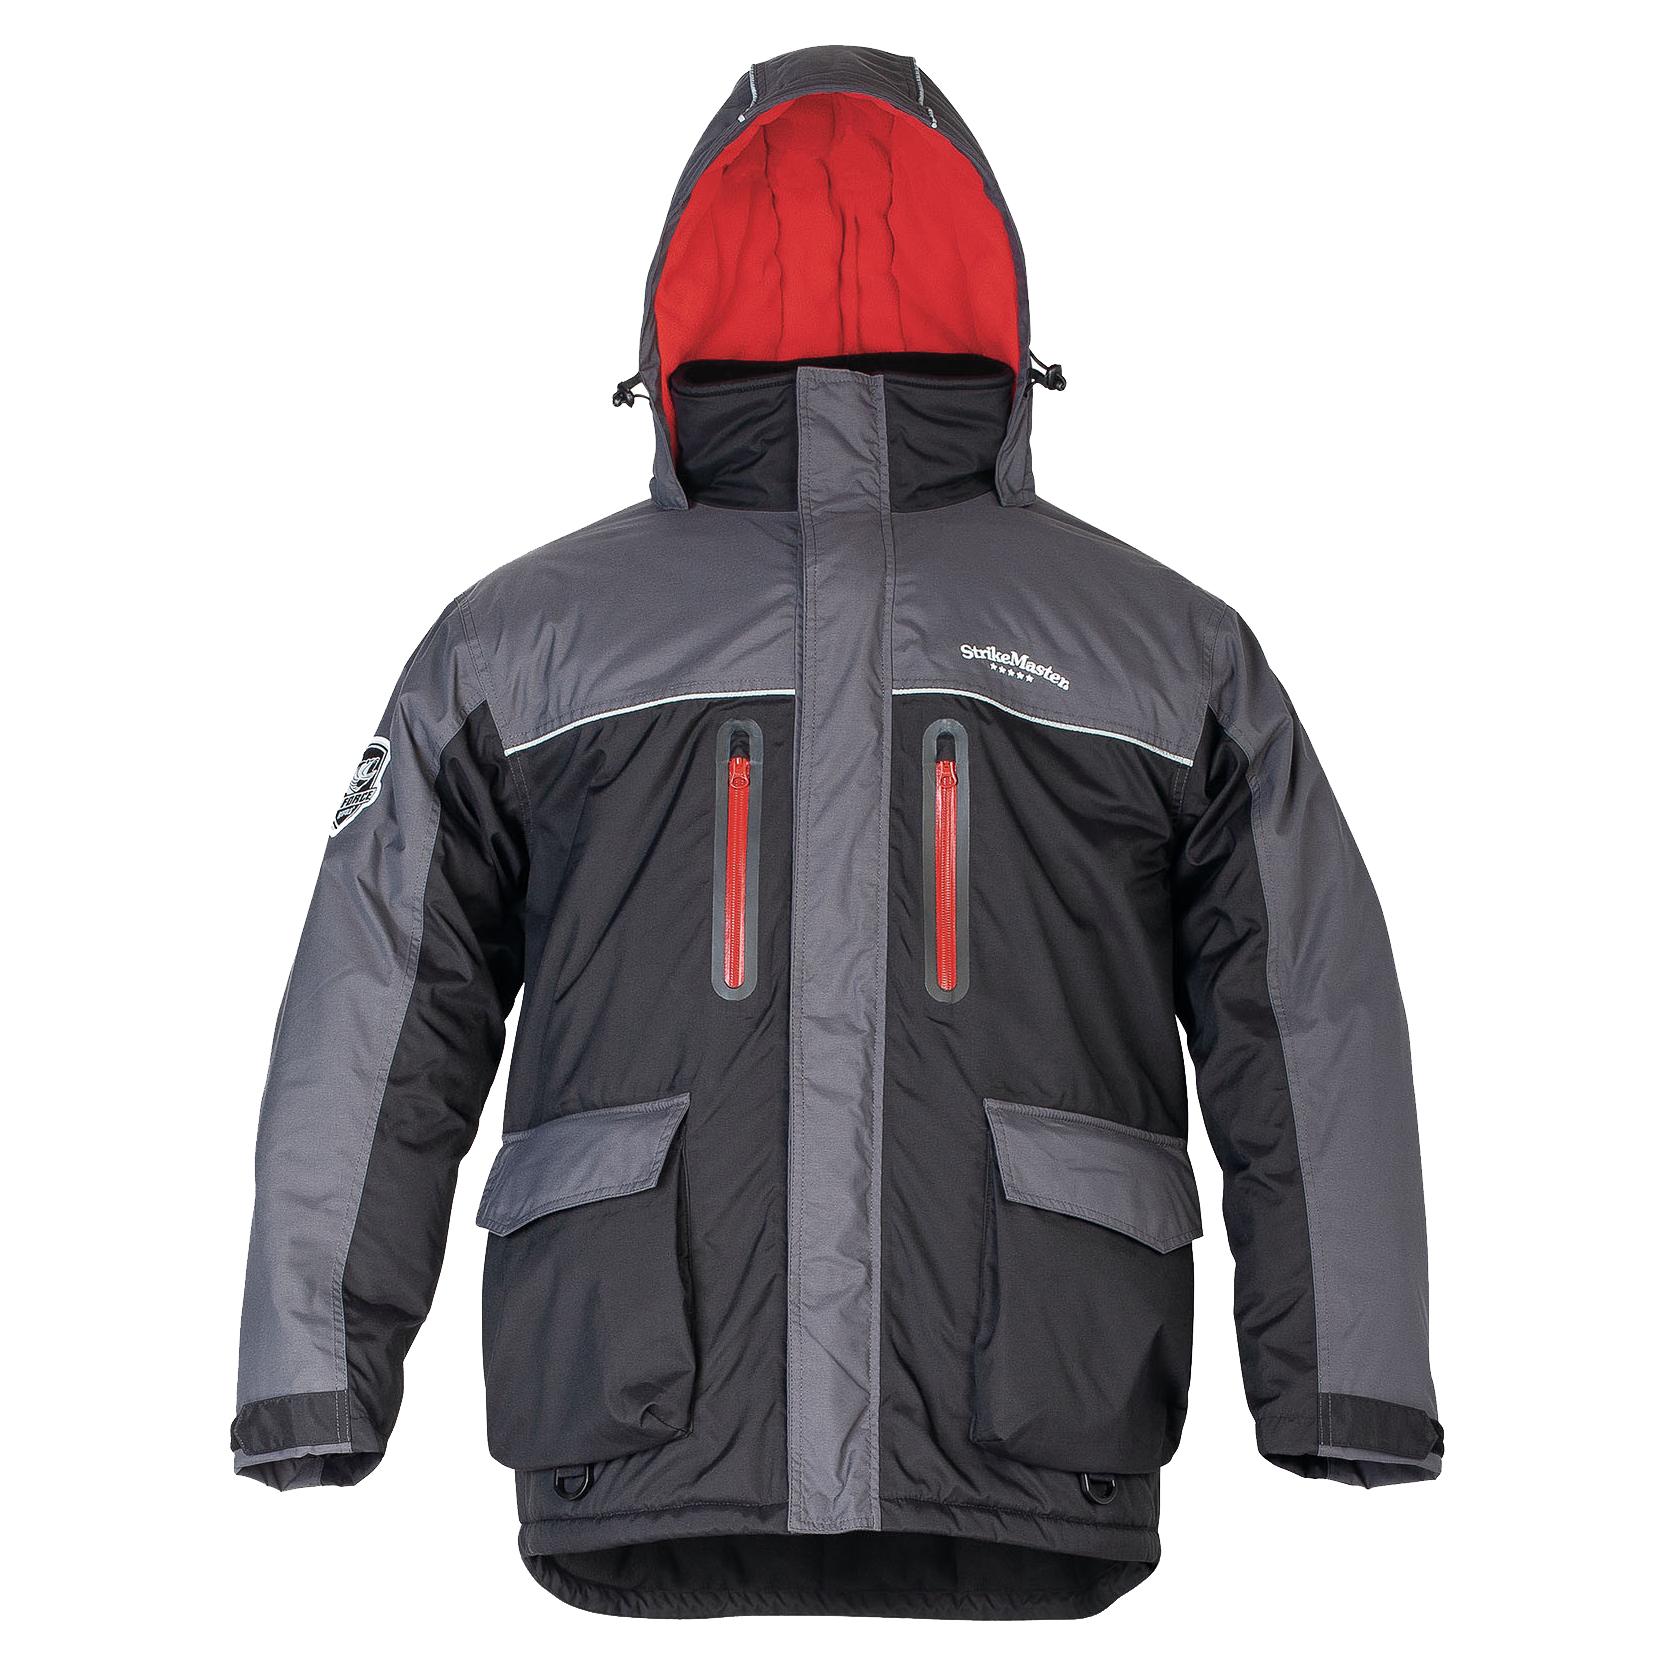 StrikeMaster Men's Battle Jacket